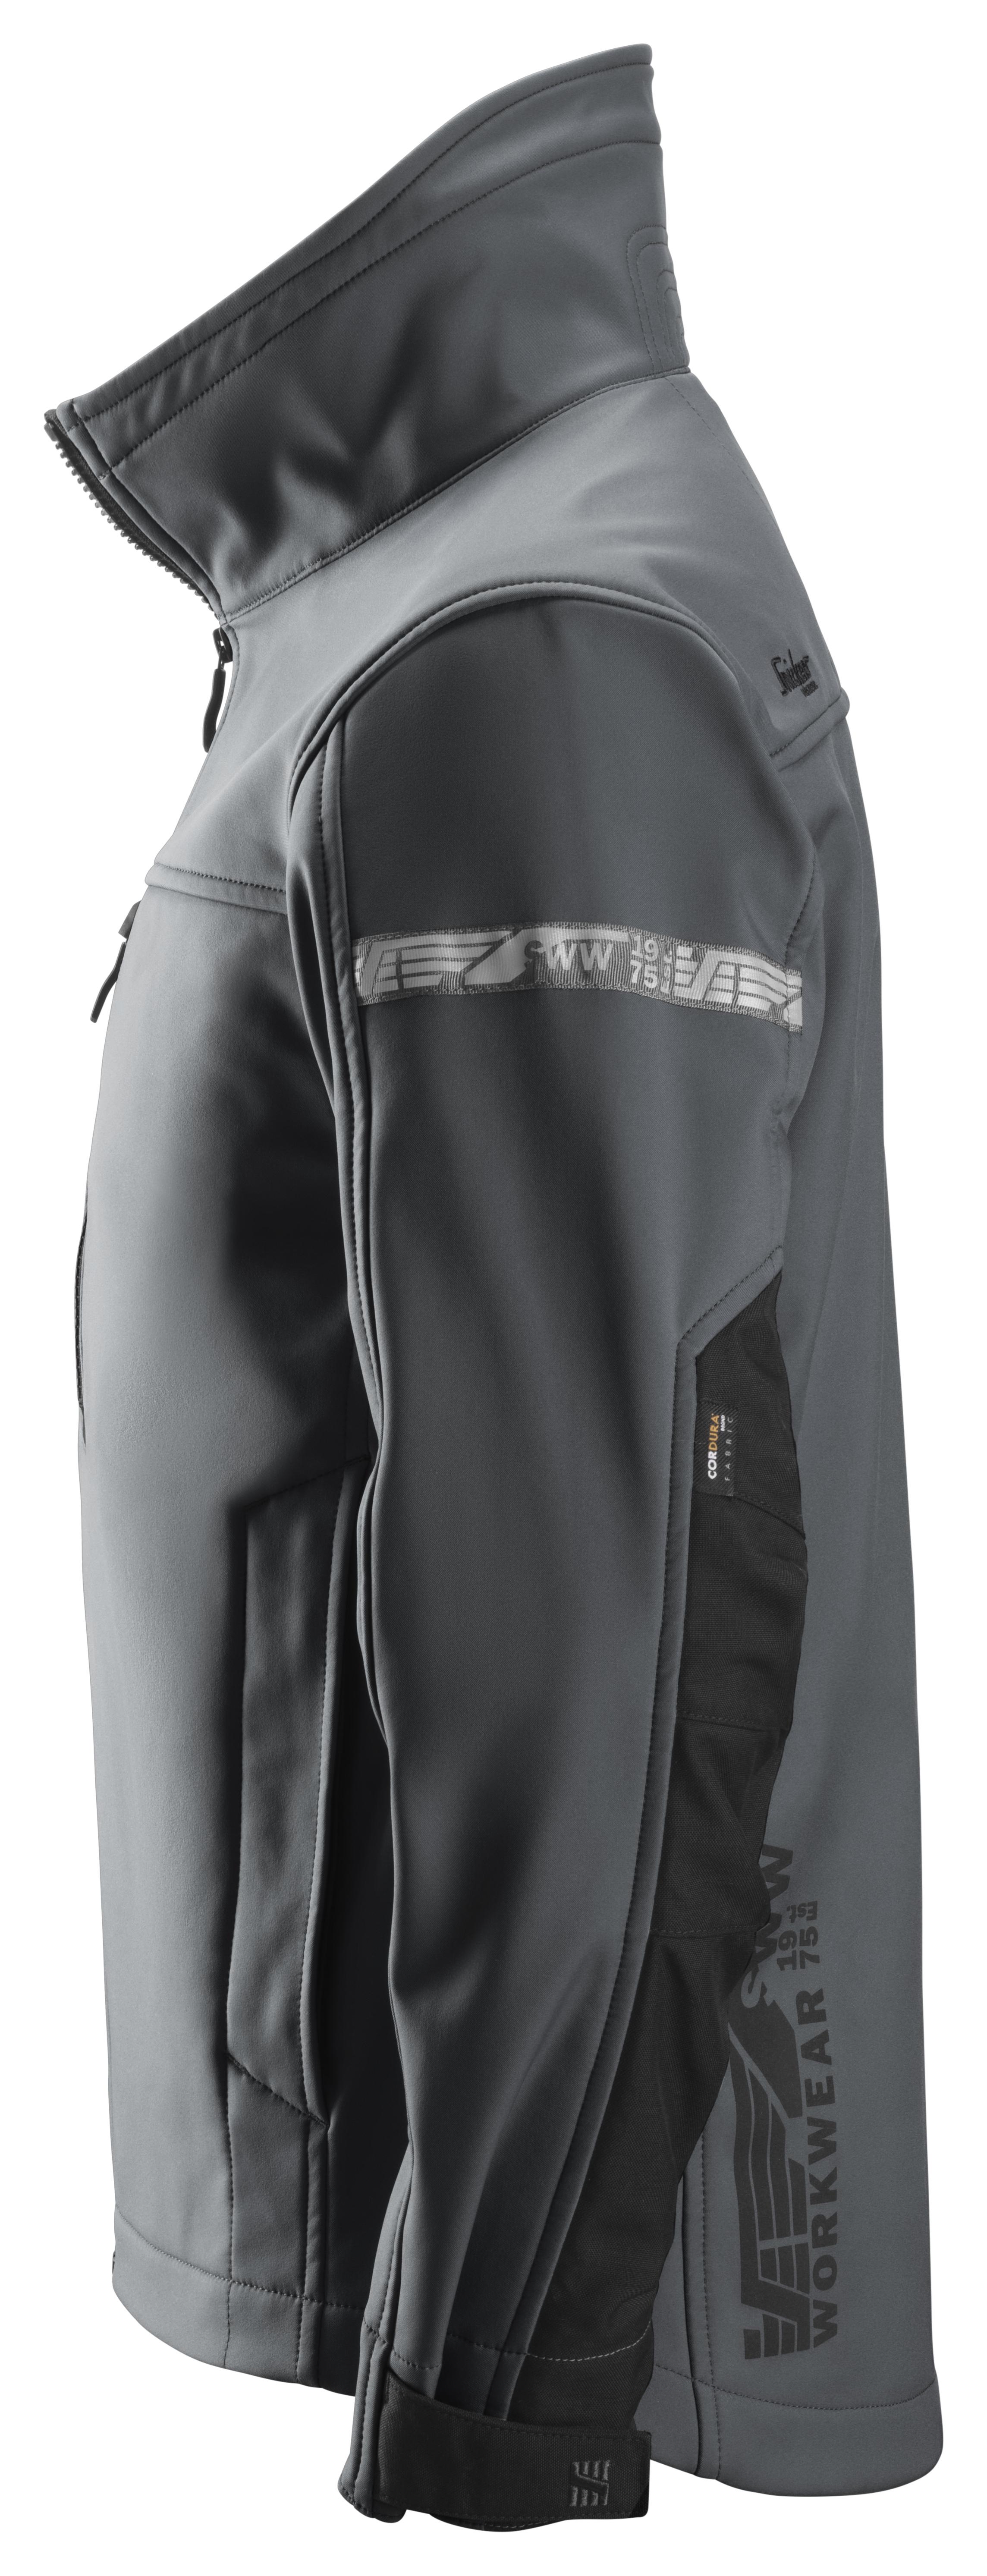 Snickers 1200 Soft Shell -takki | Steel grey\Black - 5804 | V-liftverkkokauppa.fi